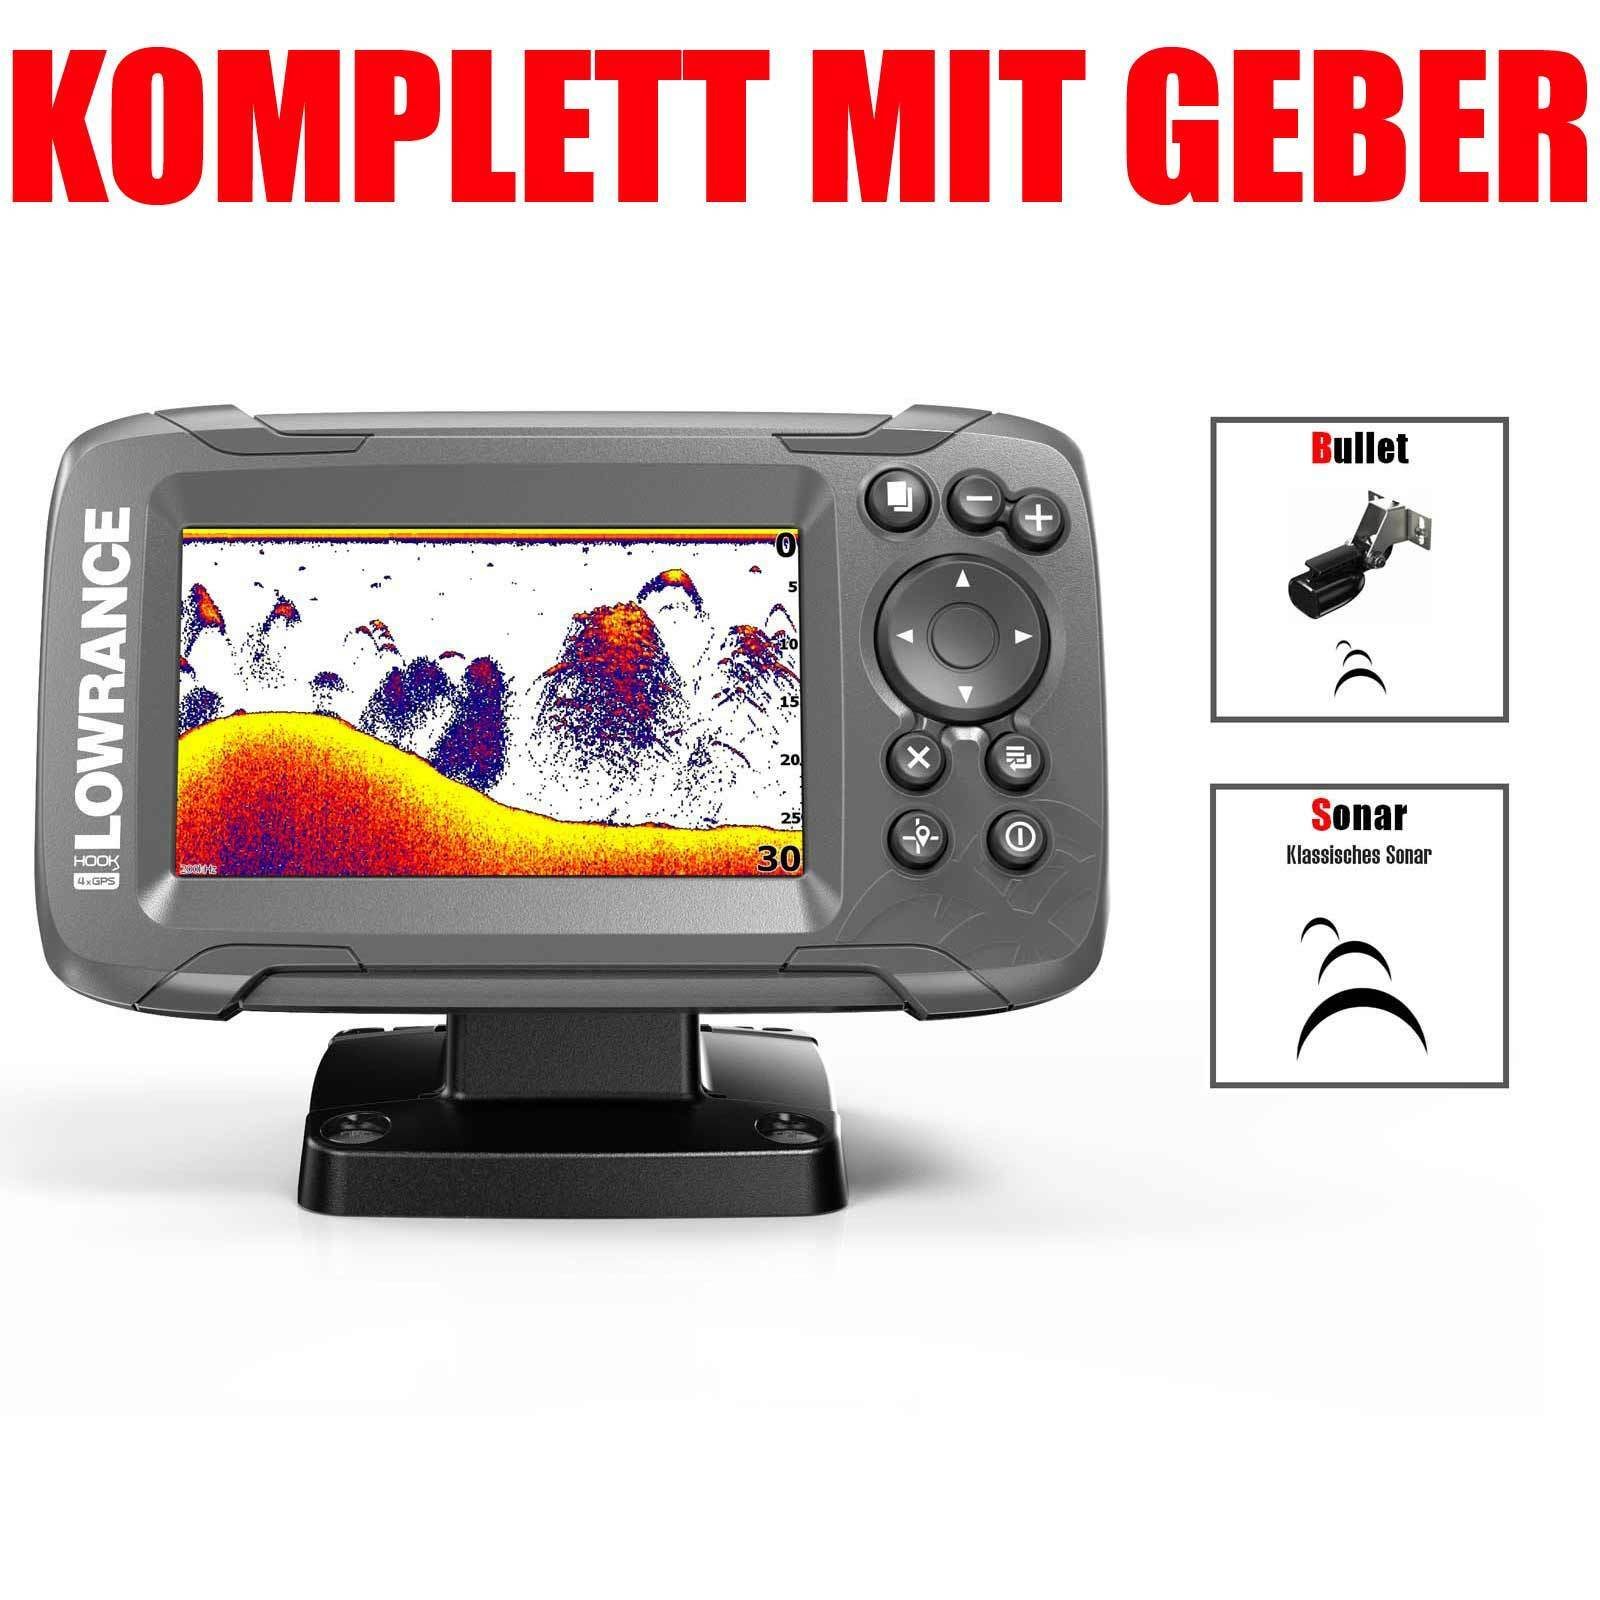 Niedrigrance Echolot GPS GPS GPS mit Geber Fischfinder Sonar Fishfinder - 4x GPS ecae7e